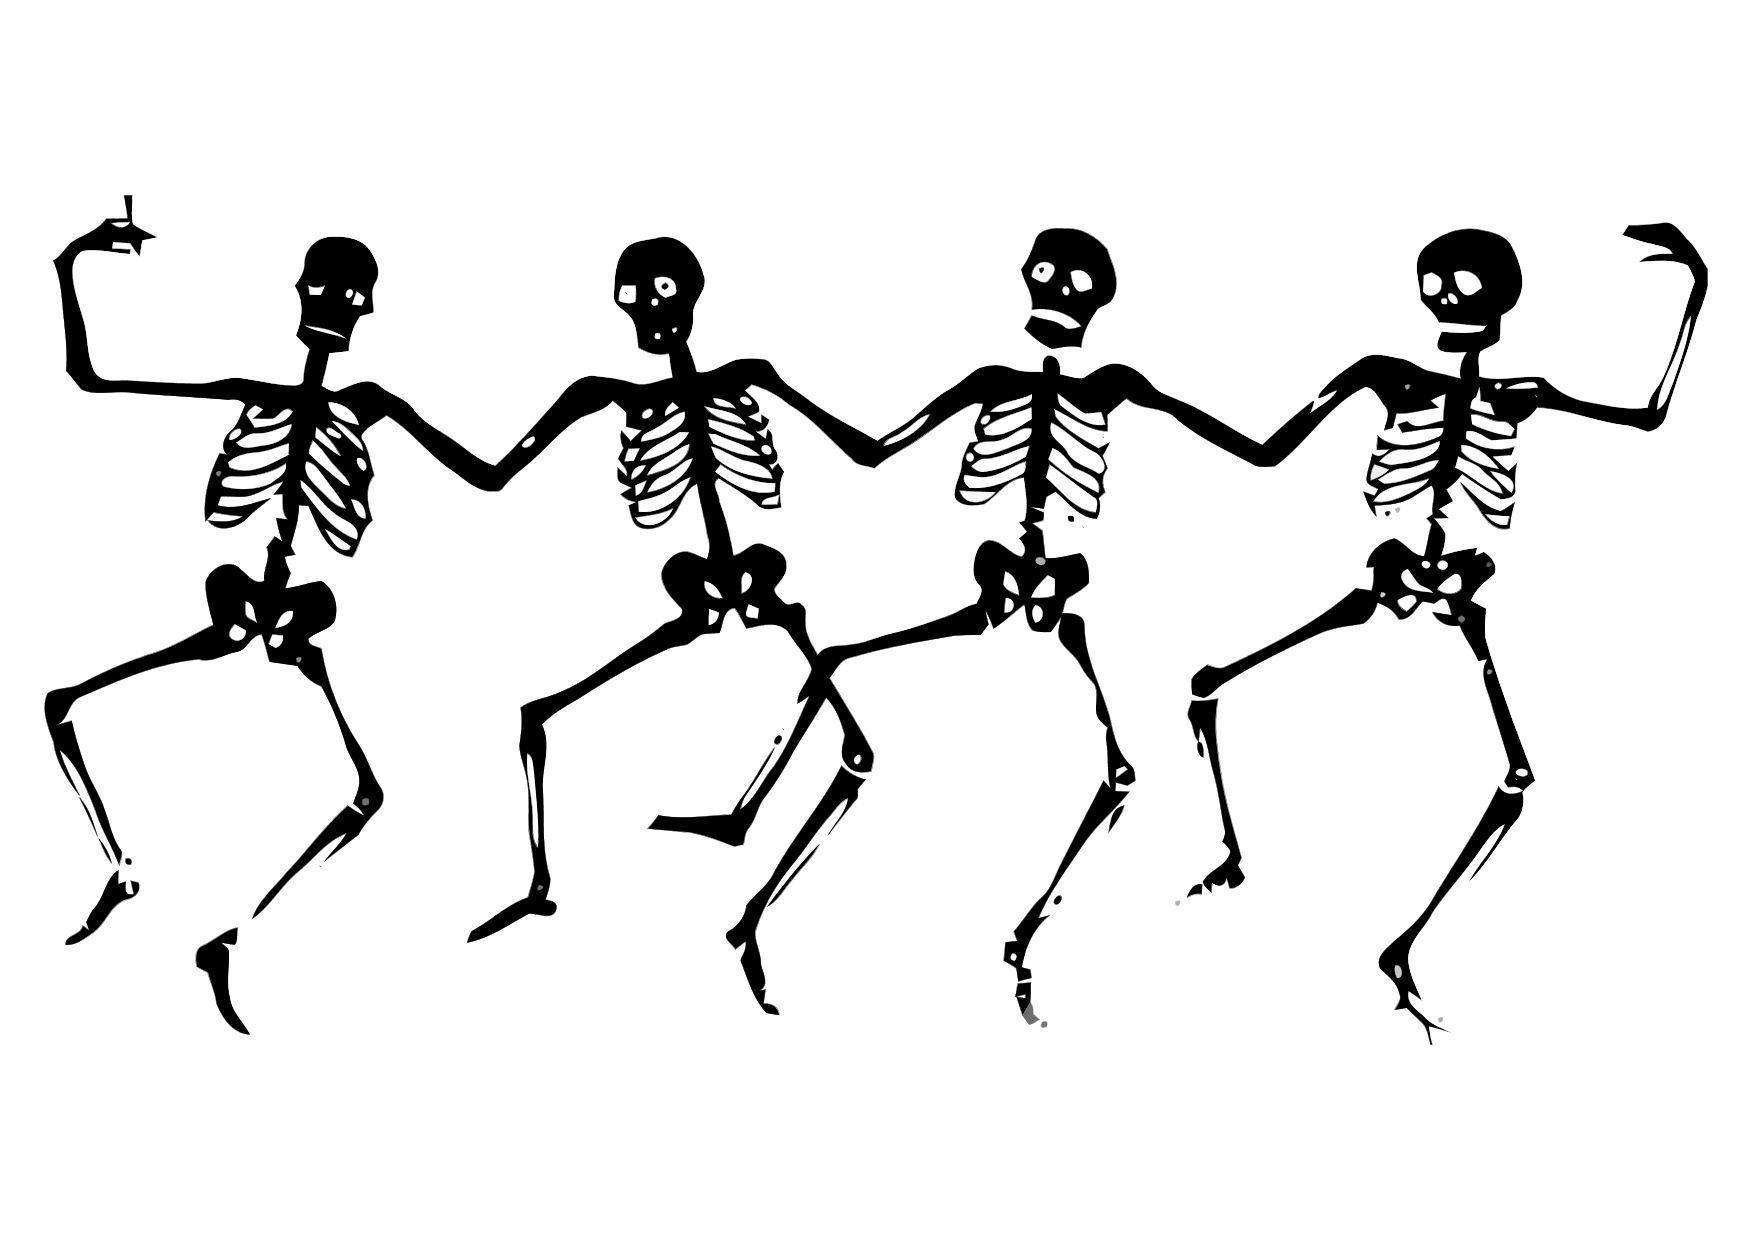 dibujo para colorear esqueletos bailando dl11310 (1) The Annexe Gallery Studio Theatre, Kuala Lumpur (6 Sept.